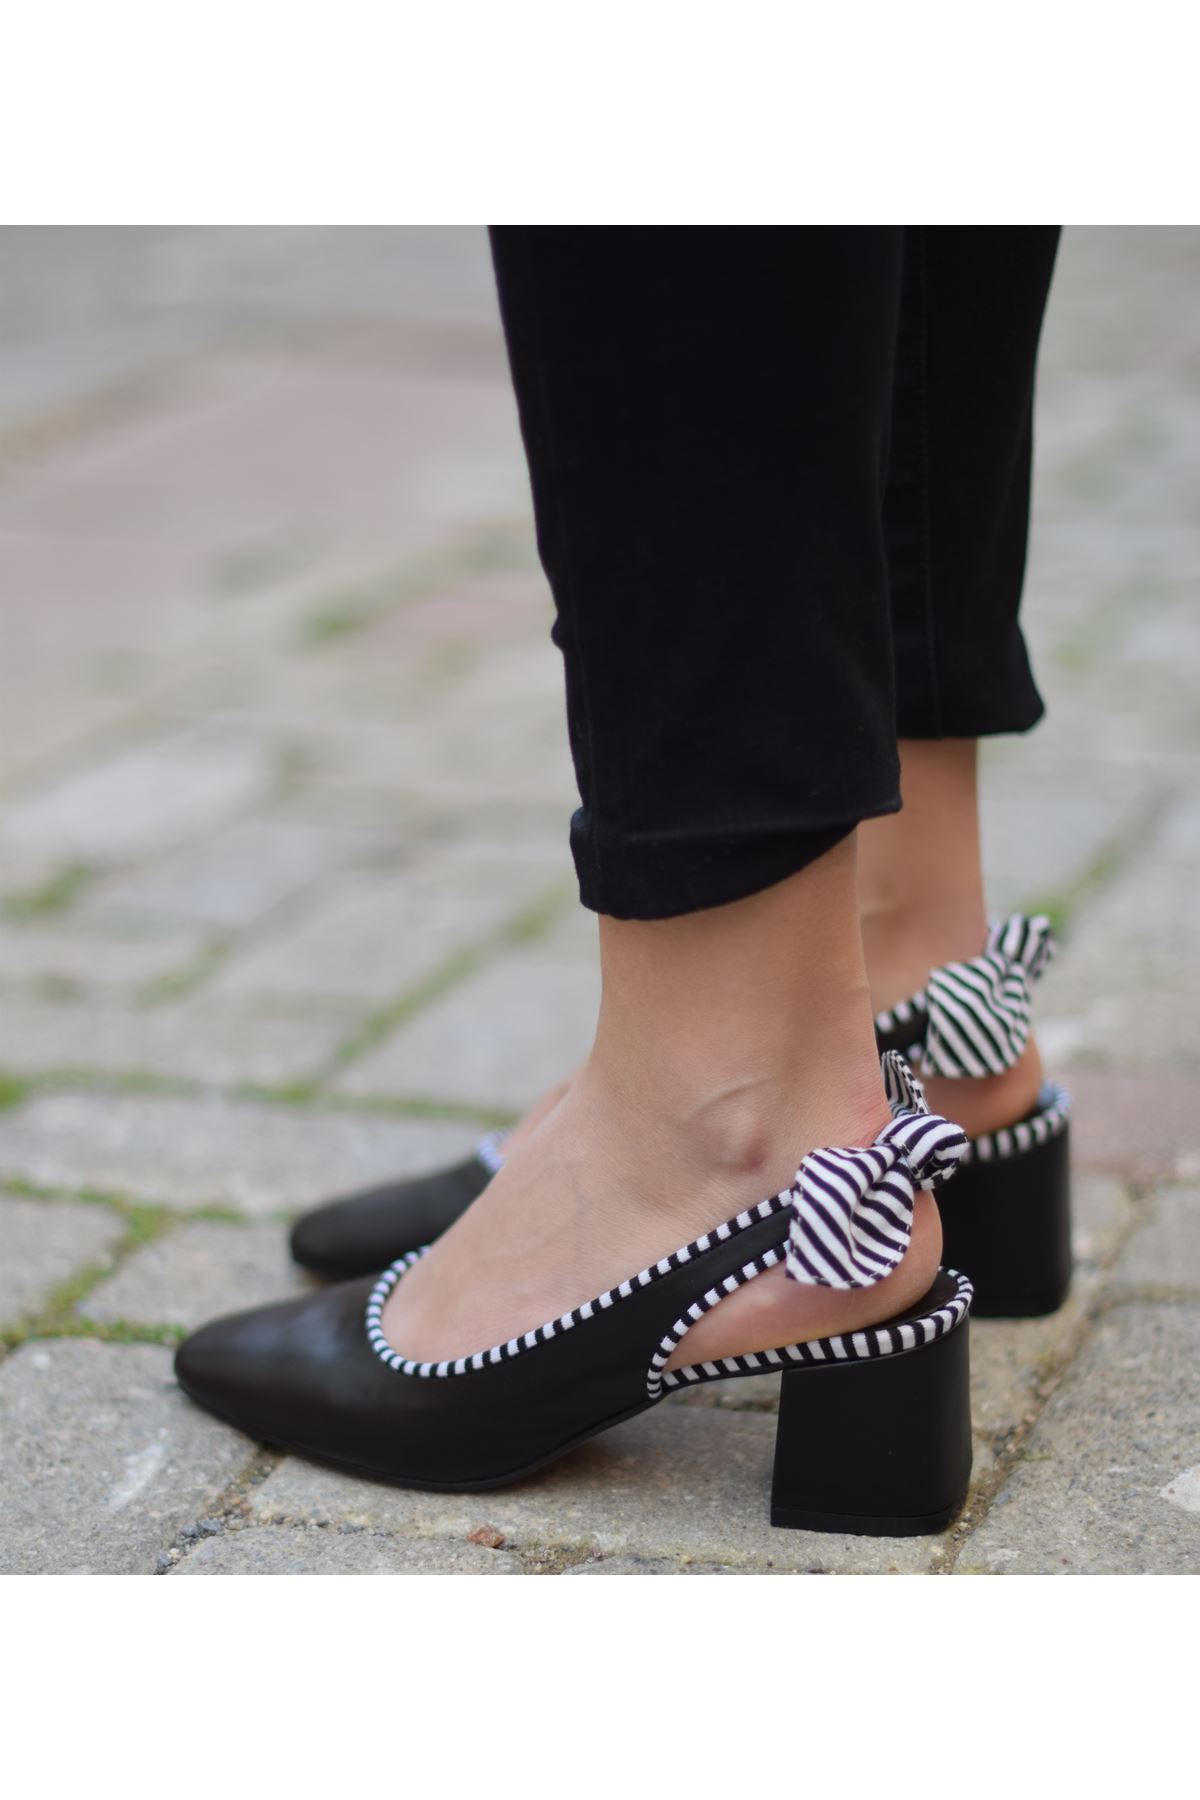 Raina Küt Burunlu Topuklu Ayakkabı Siyah